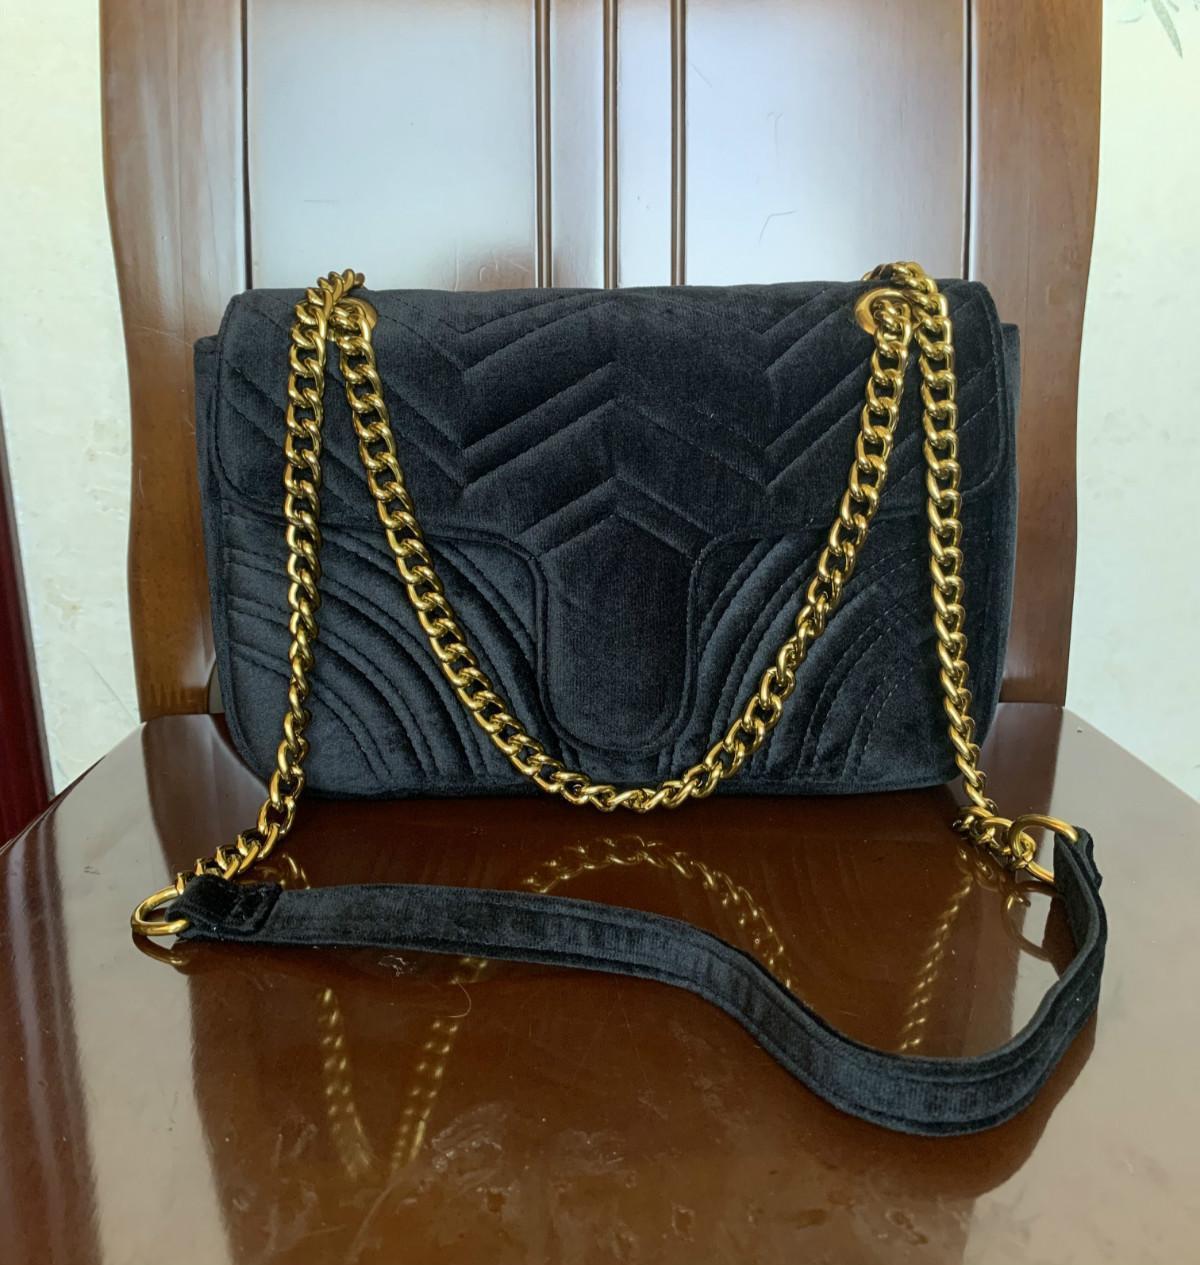 2018 TOP Moda bolsa de maquiagem cadeia de preto saco famoso saco de luxo partido Marmont veludo ombro Mulheres designer sacos gratuito shiopping # 5118